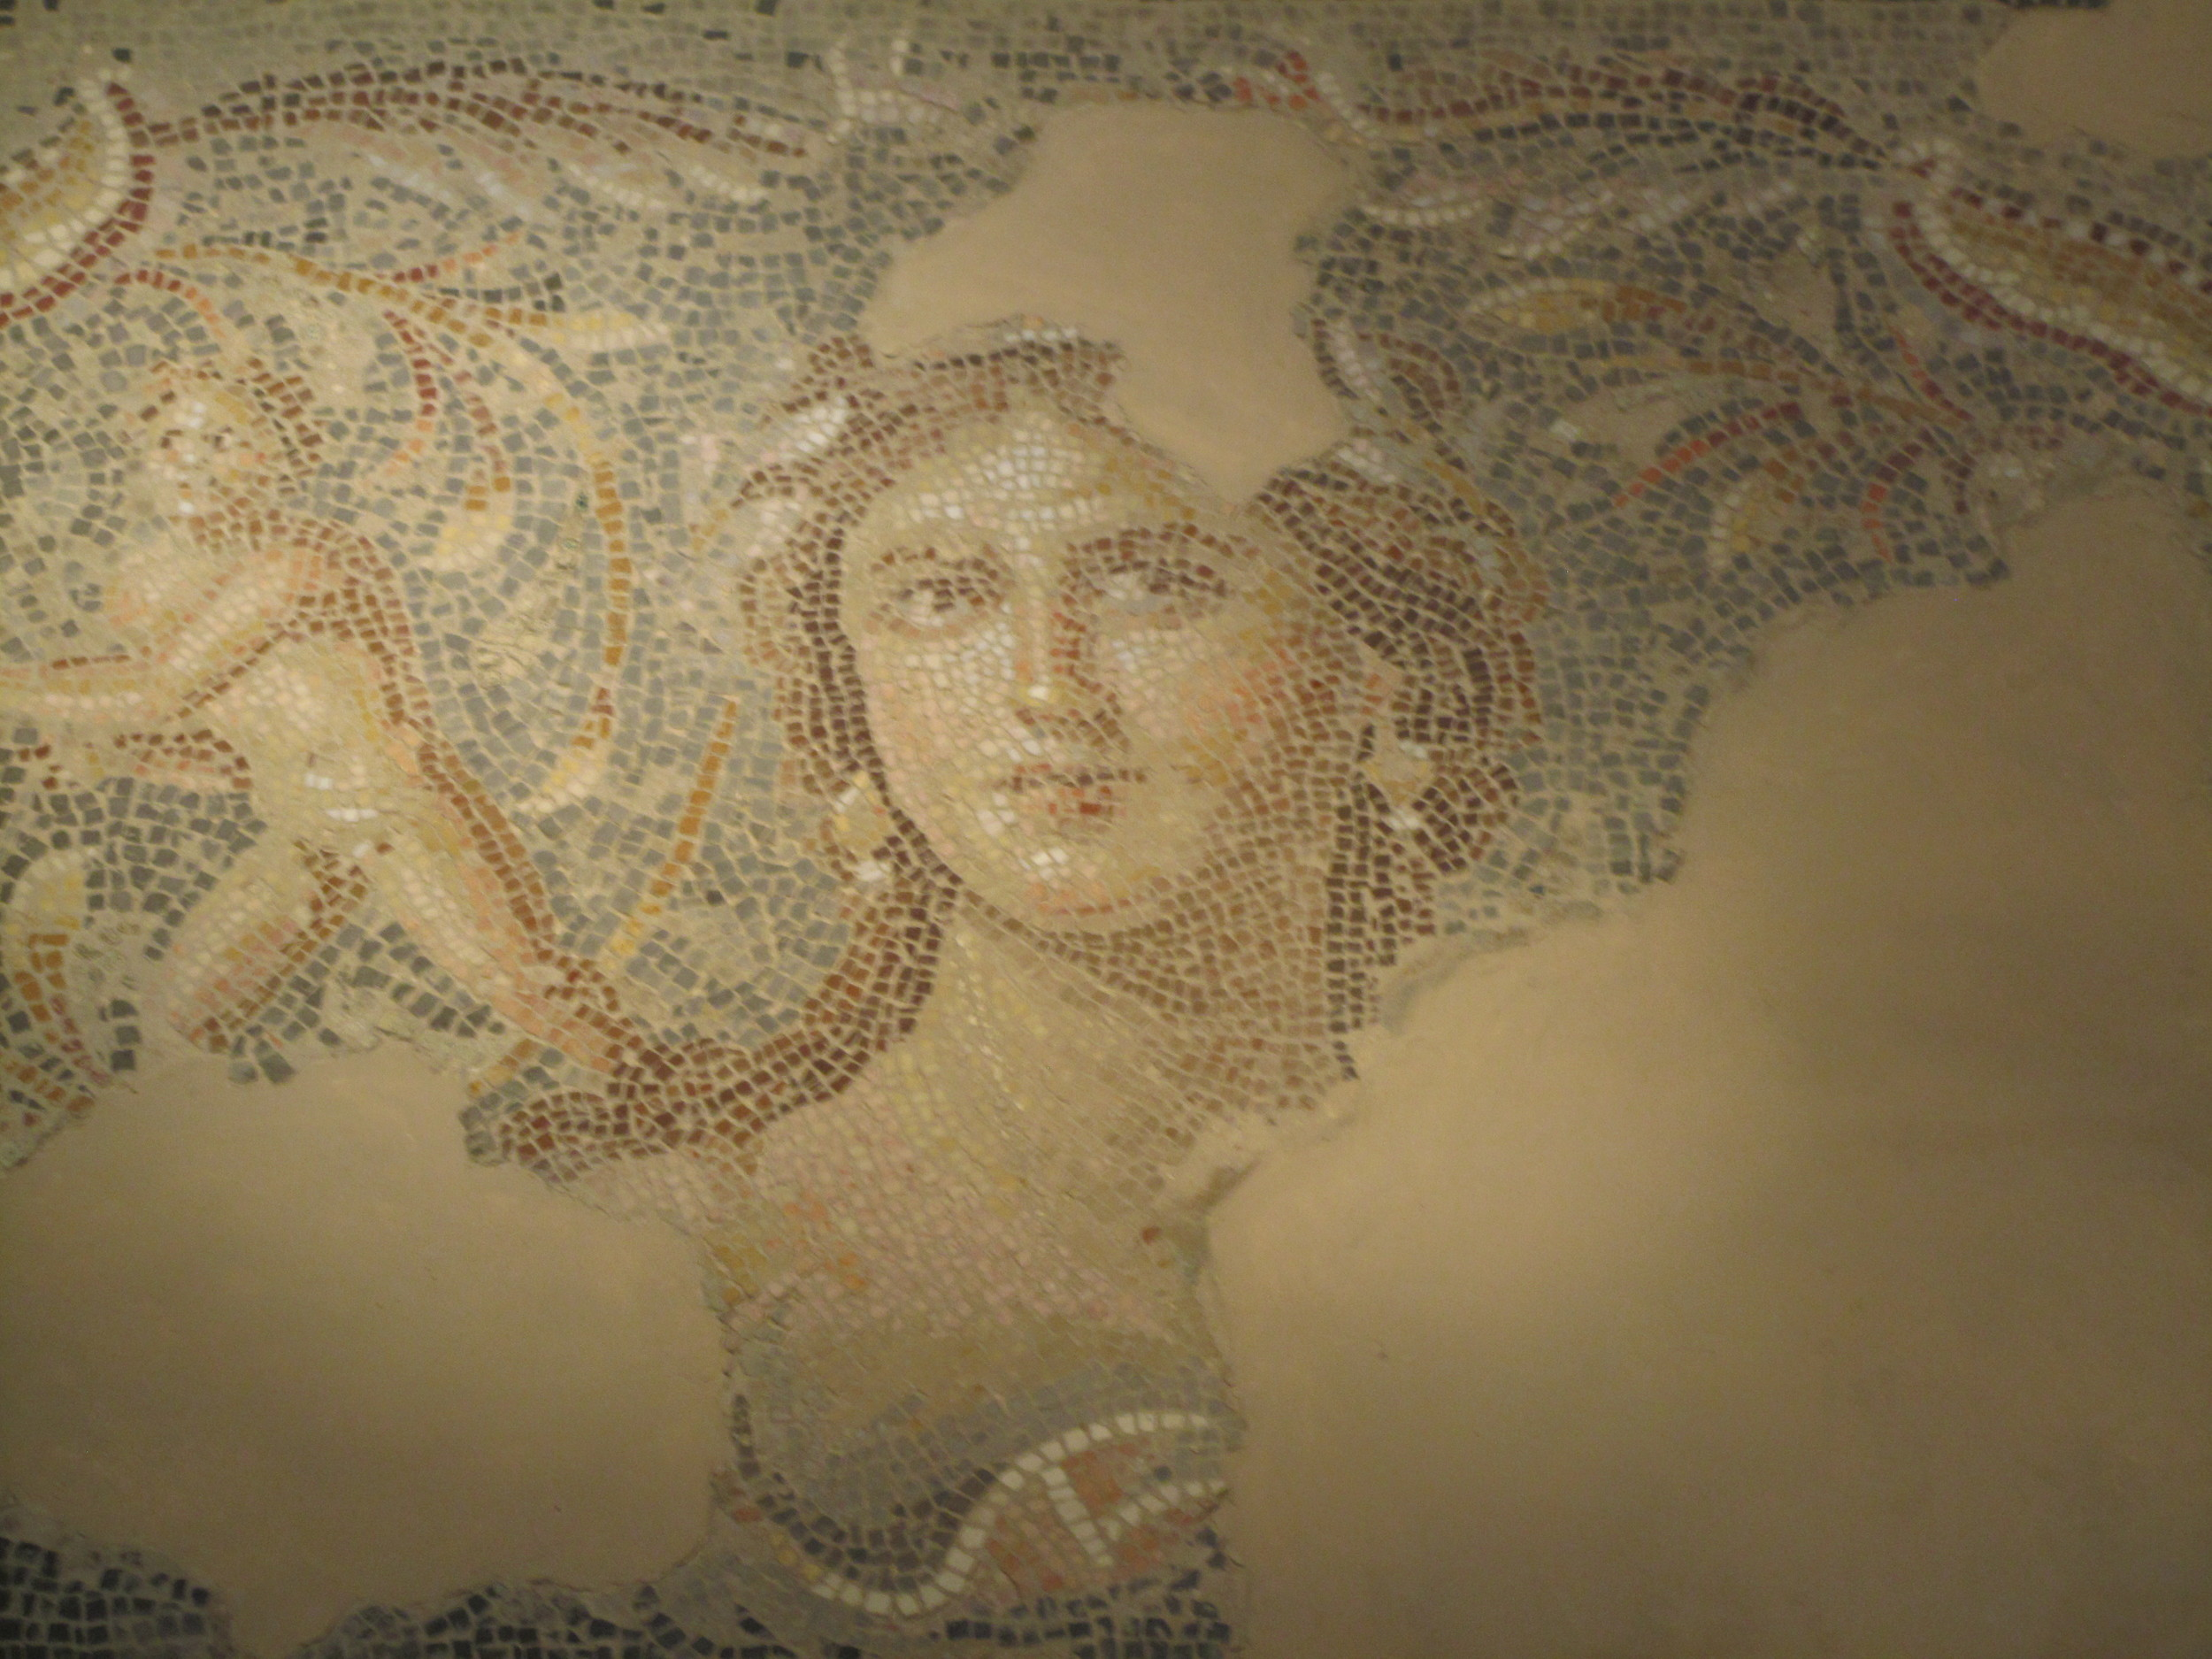 The Mona Lisa of the Galilee mosaic